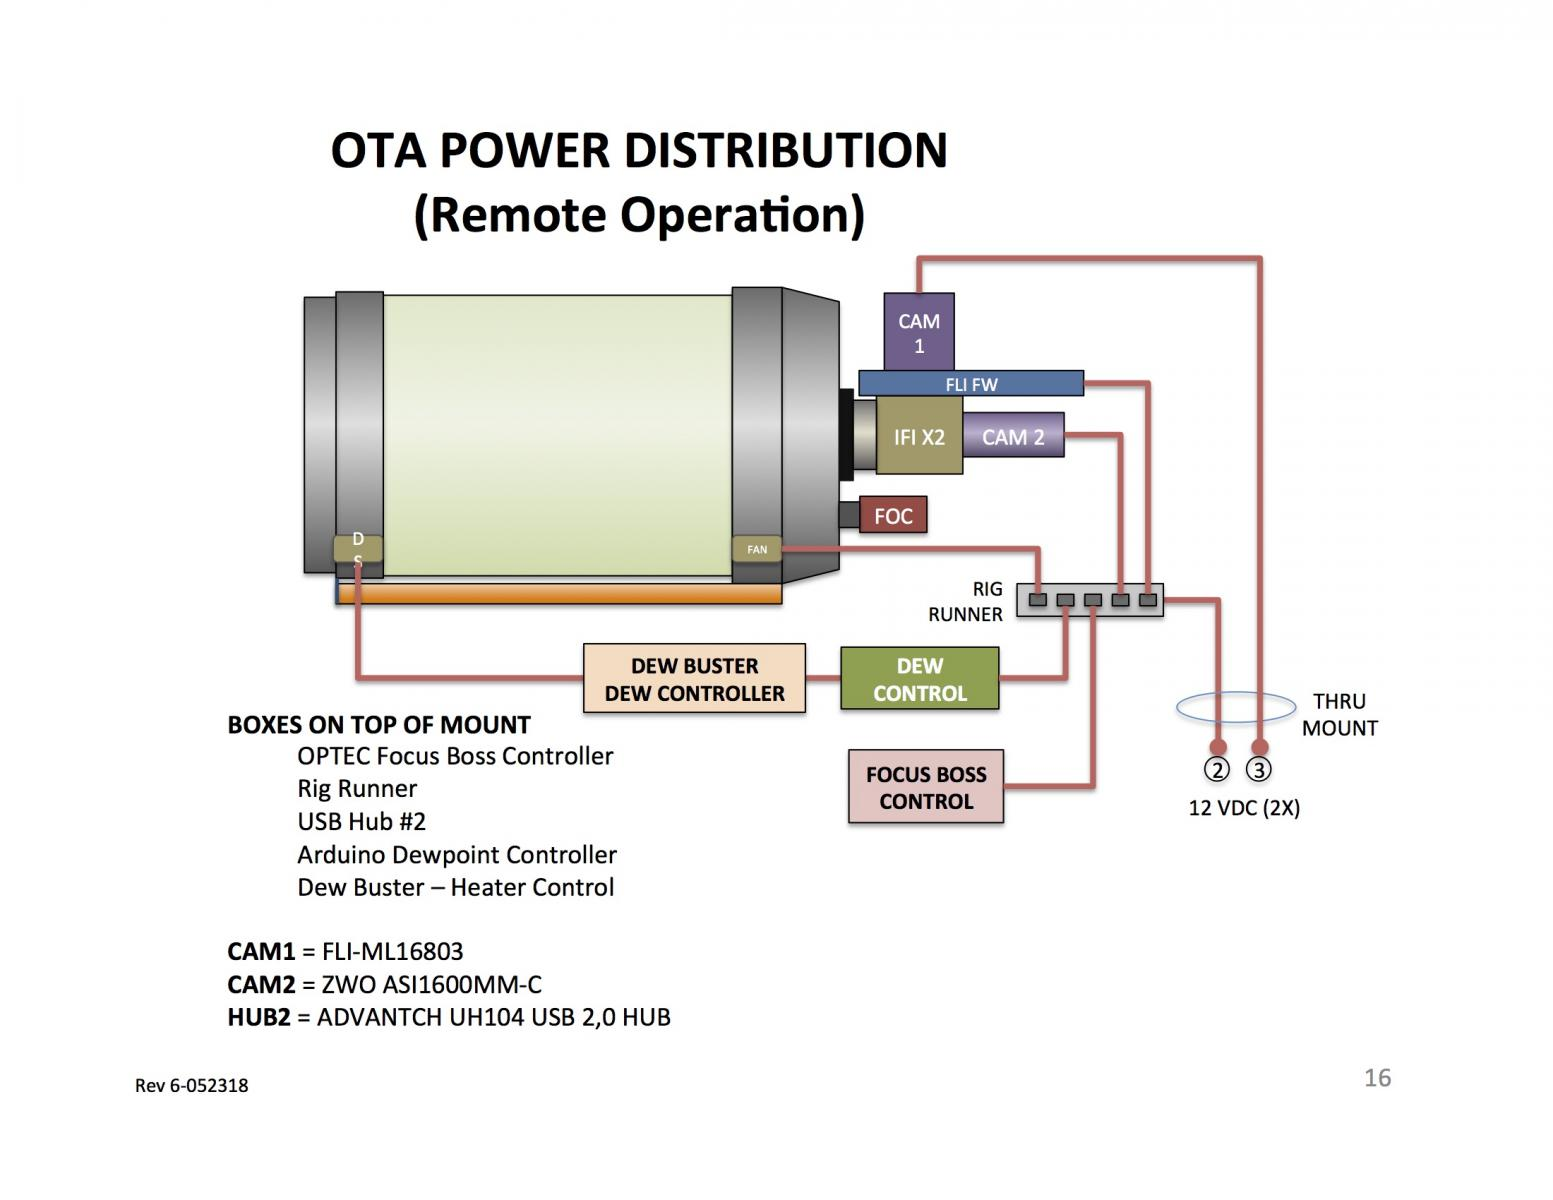 Designing a RigRunner system for remote observatory - Help ... on